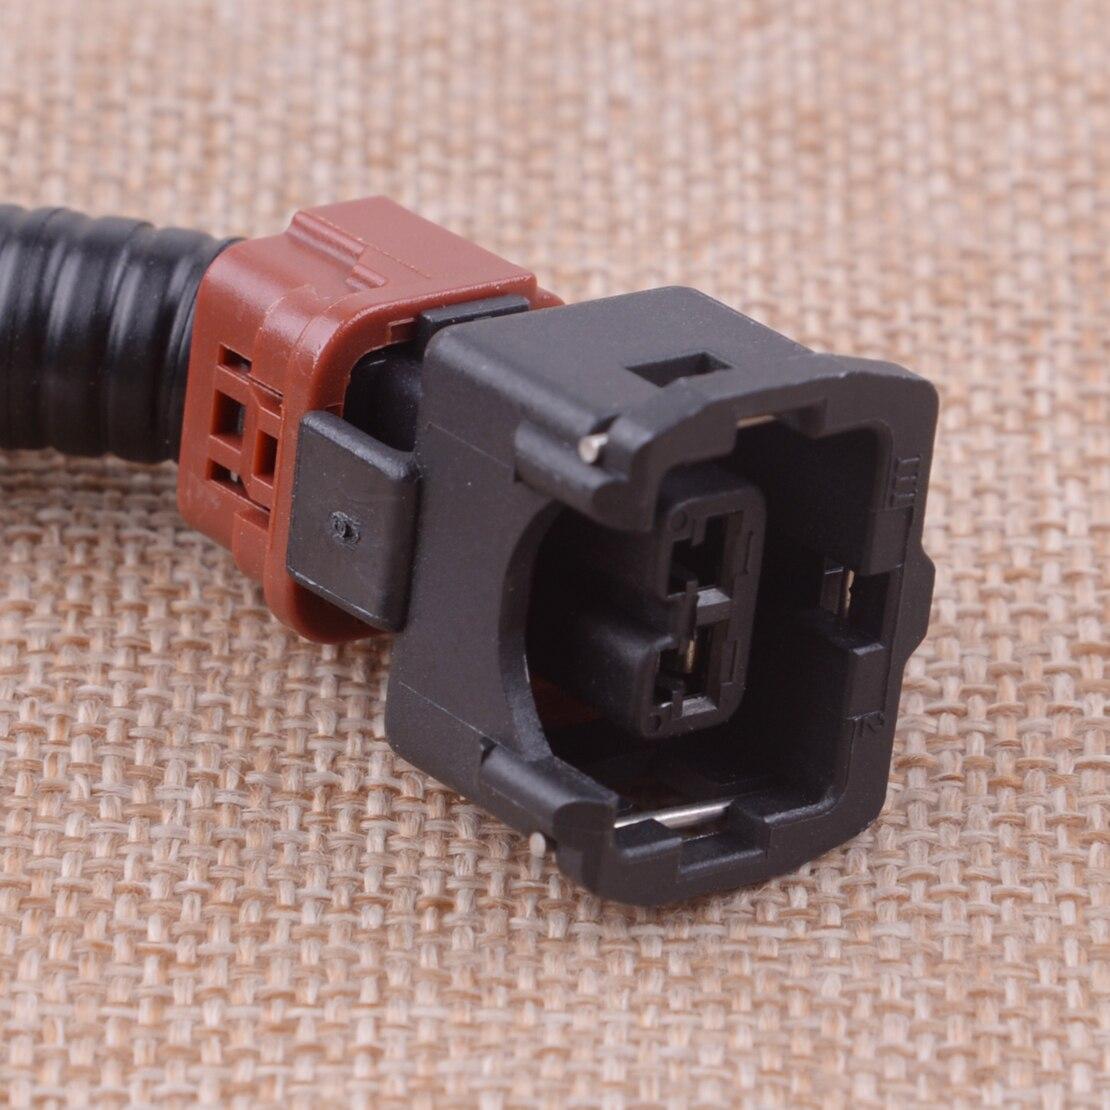 Citall 24079 31u01 Car Knock Sensor And Wire Harness Kit For Nissan G20  1993 Infiniti G20 Wiring Harness